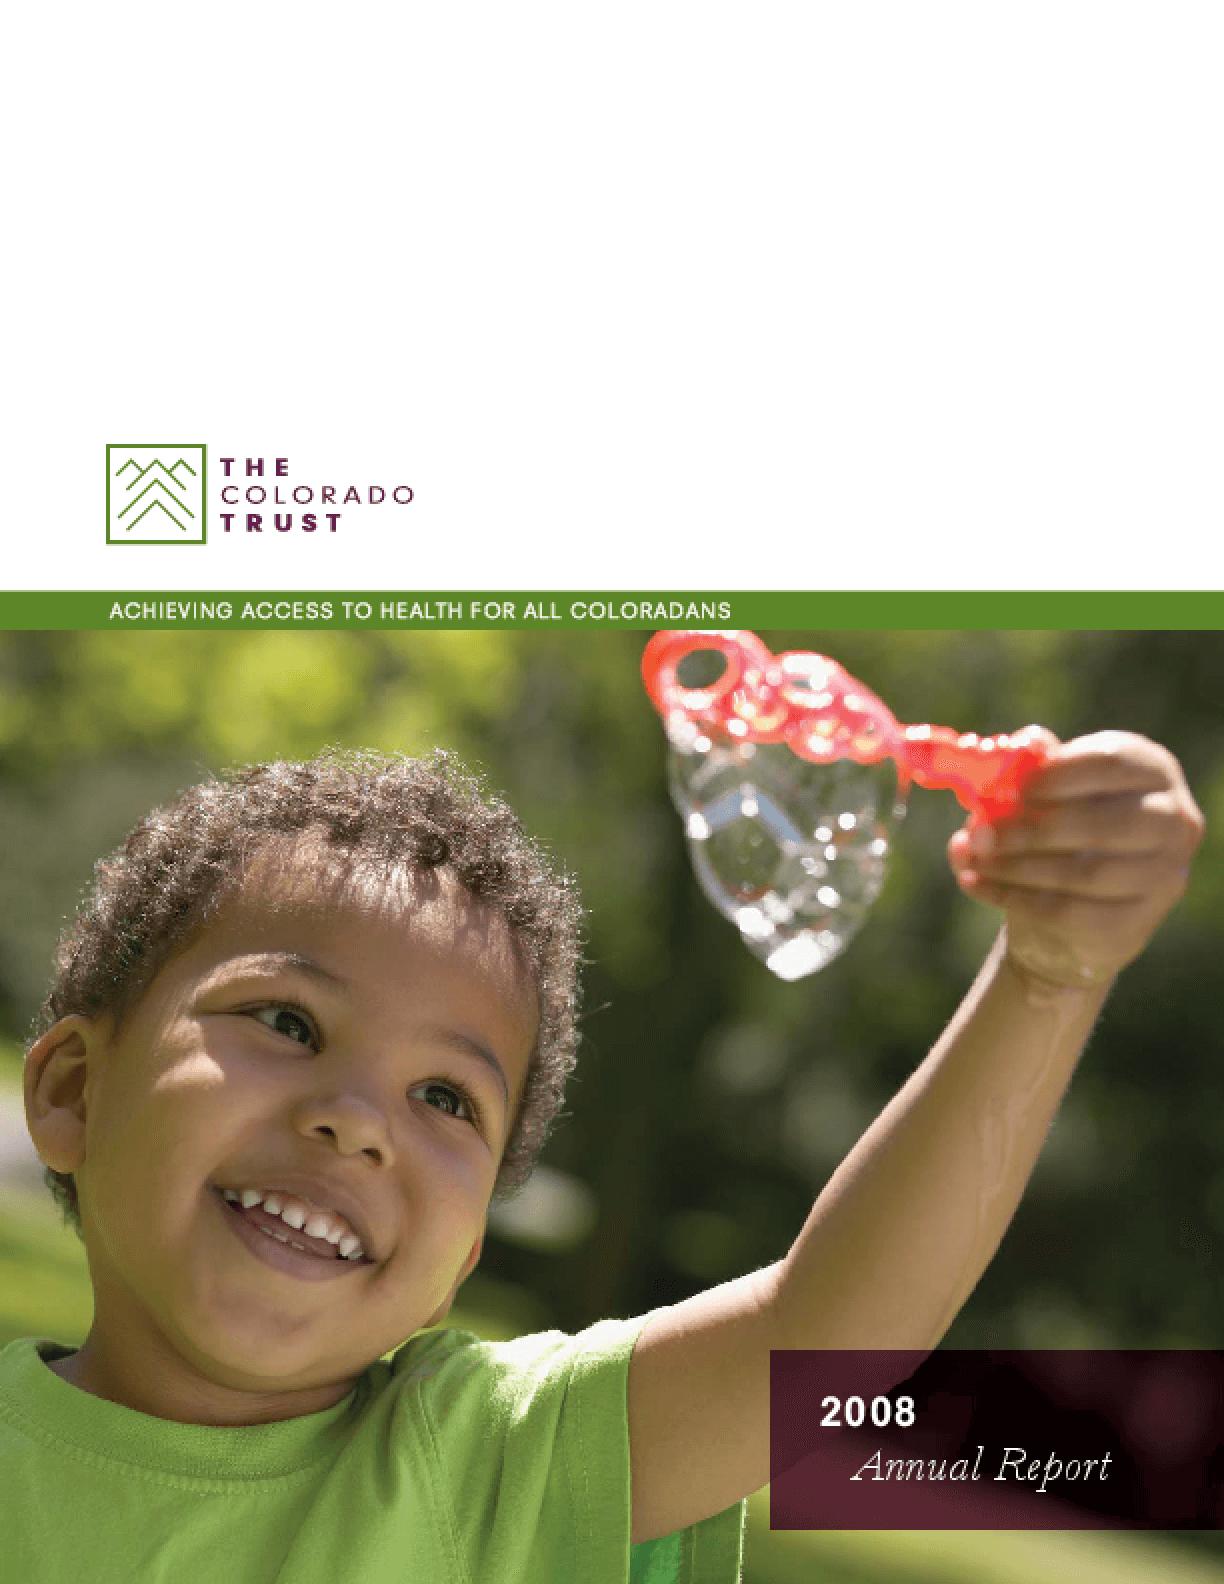 Colorado Trust - 2008 Annual Report